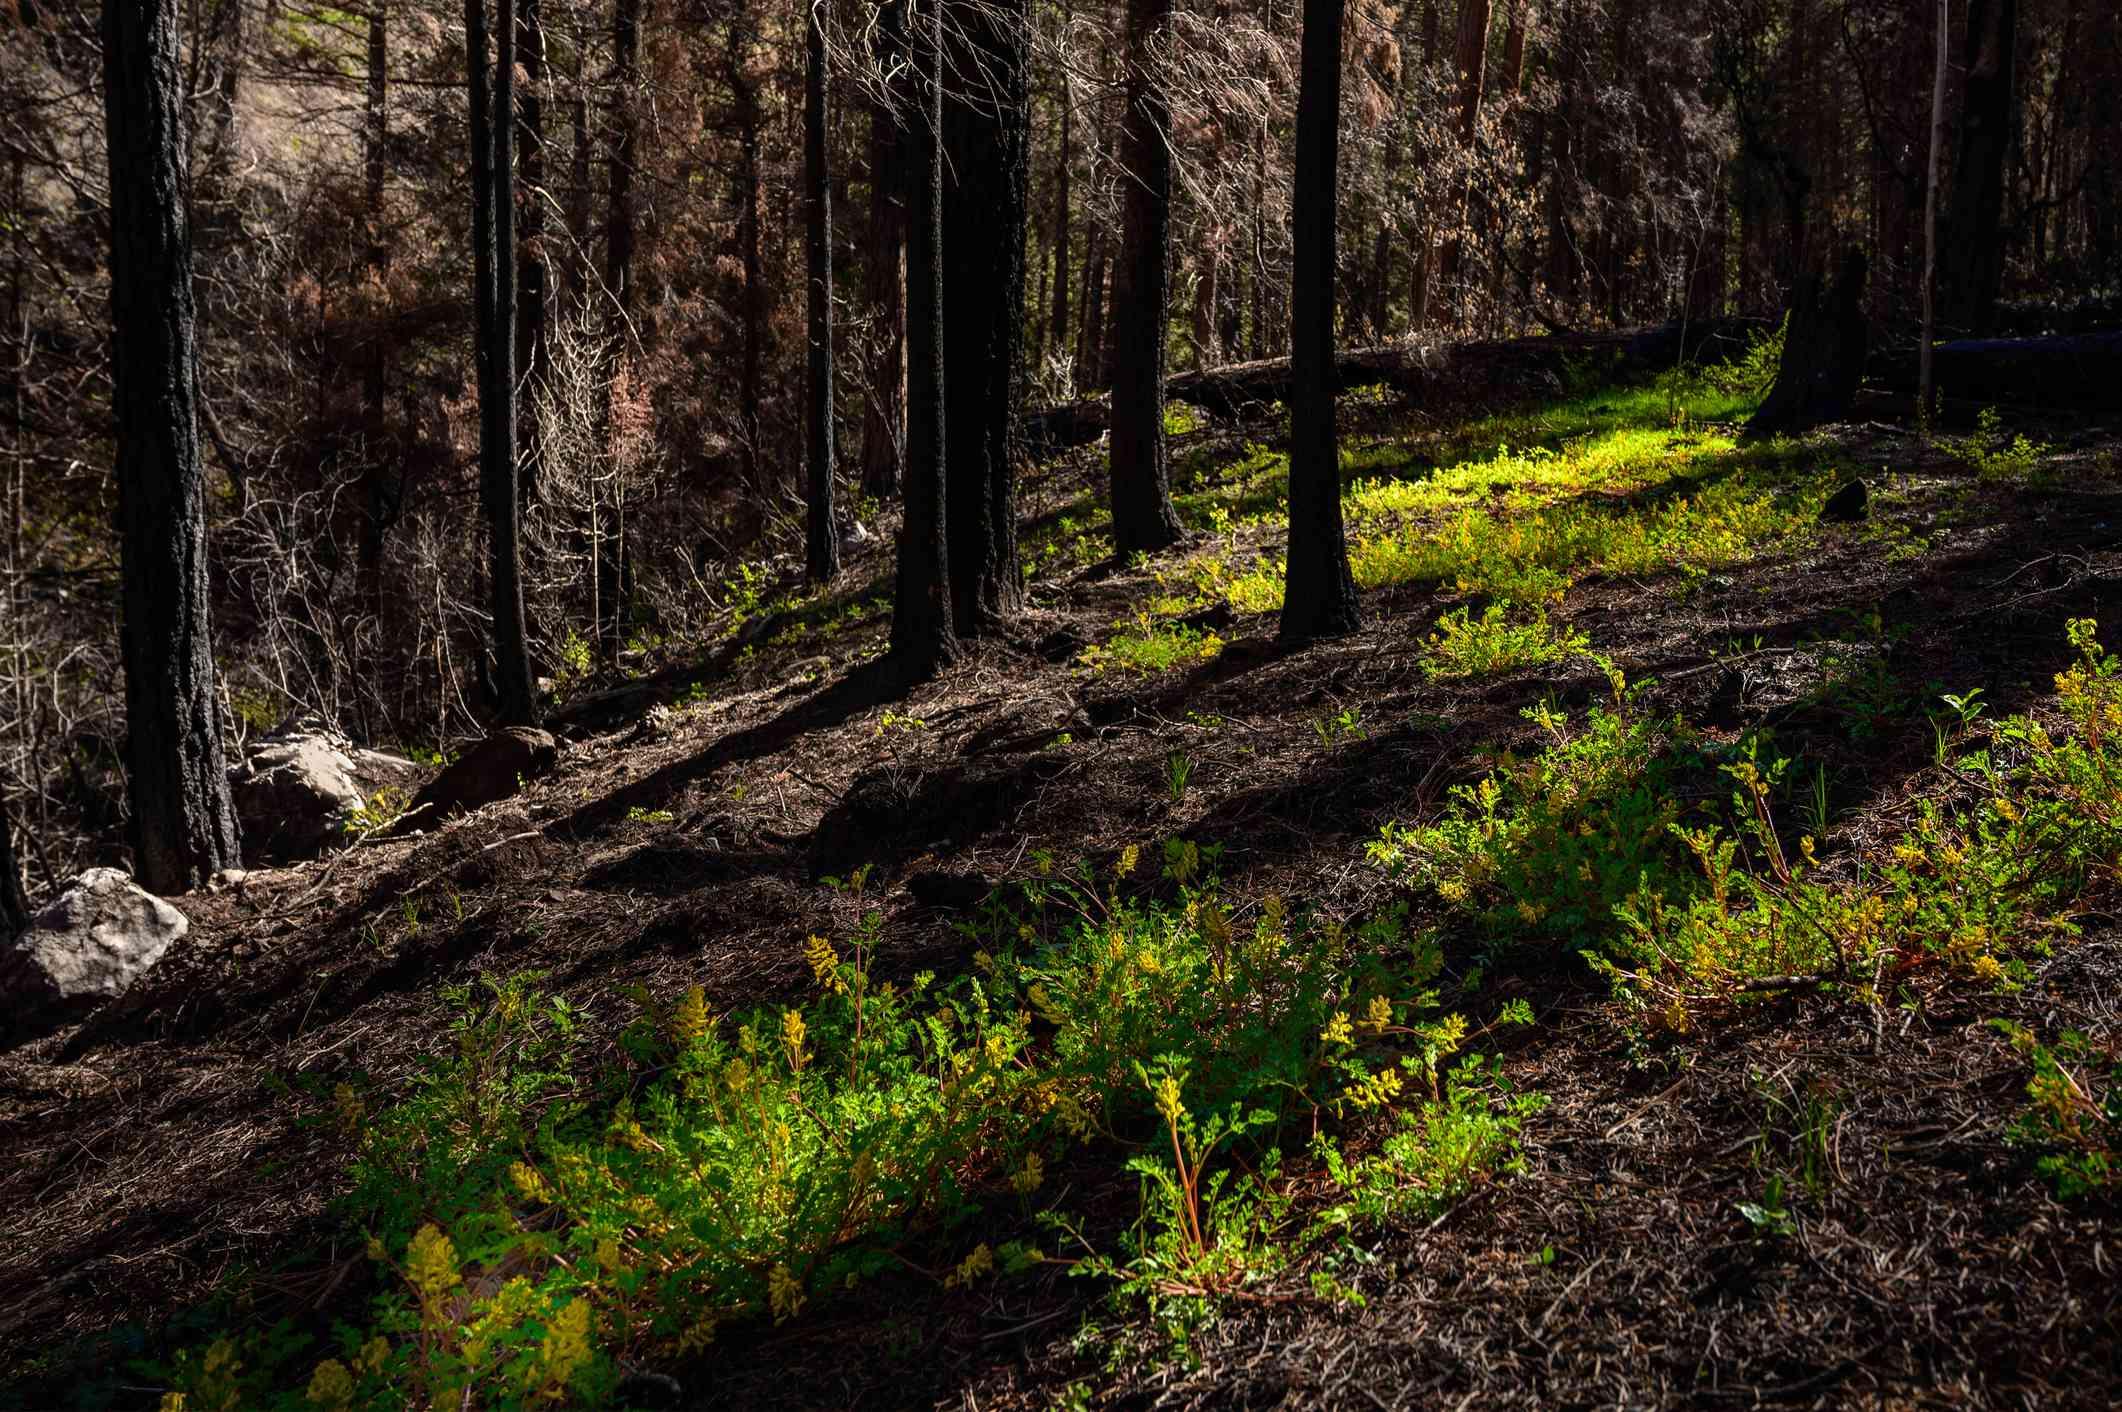 Sunlight on Yellow Wildflowers in Burnt Forest Hillside